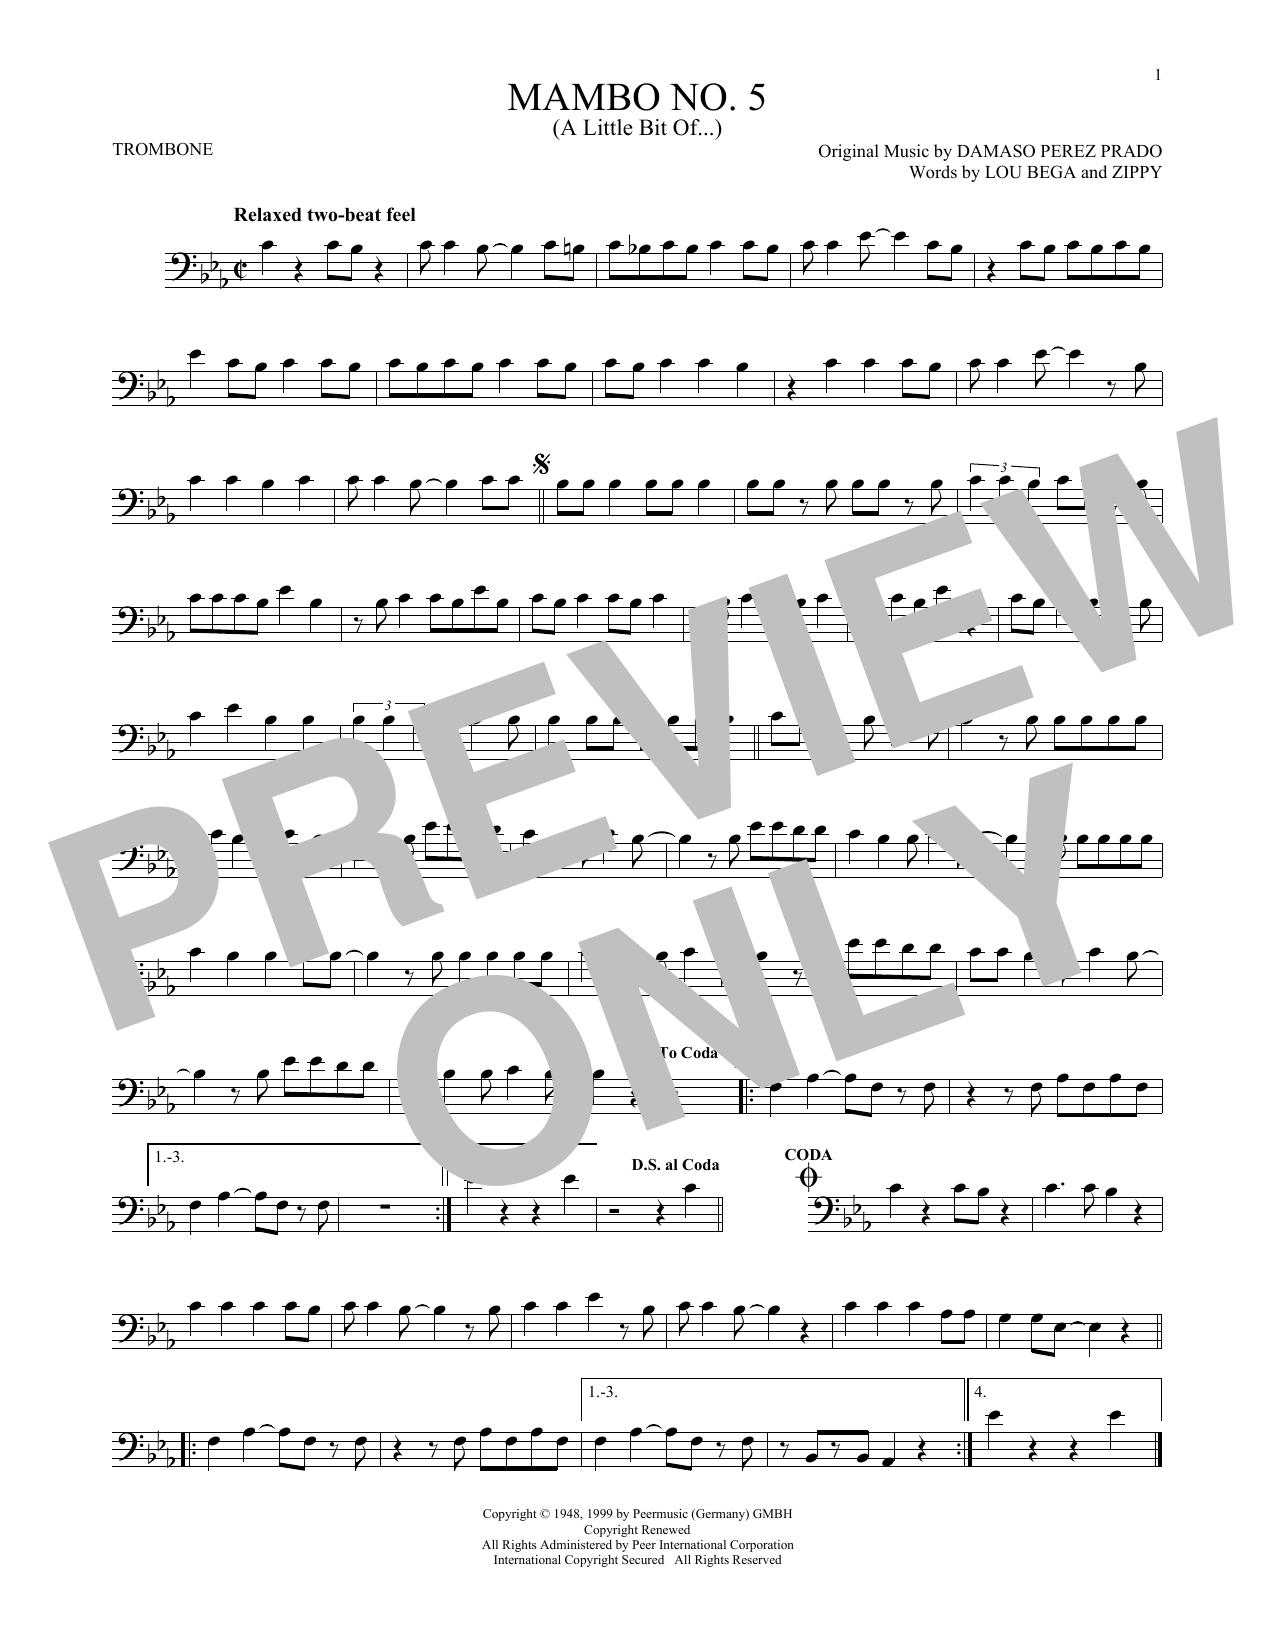 Mambo No. 5 (A Little Bit Of...) (Trombone Solo)